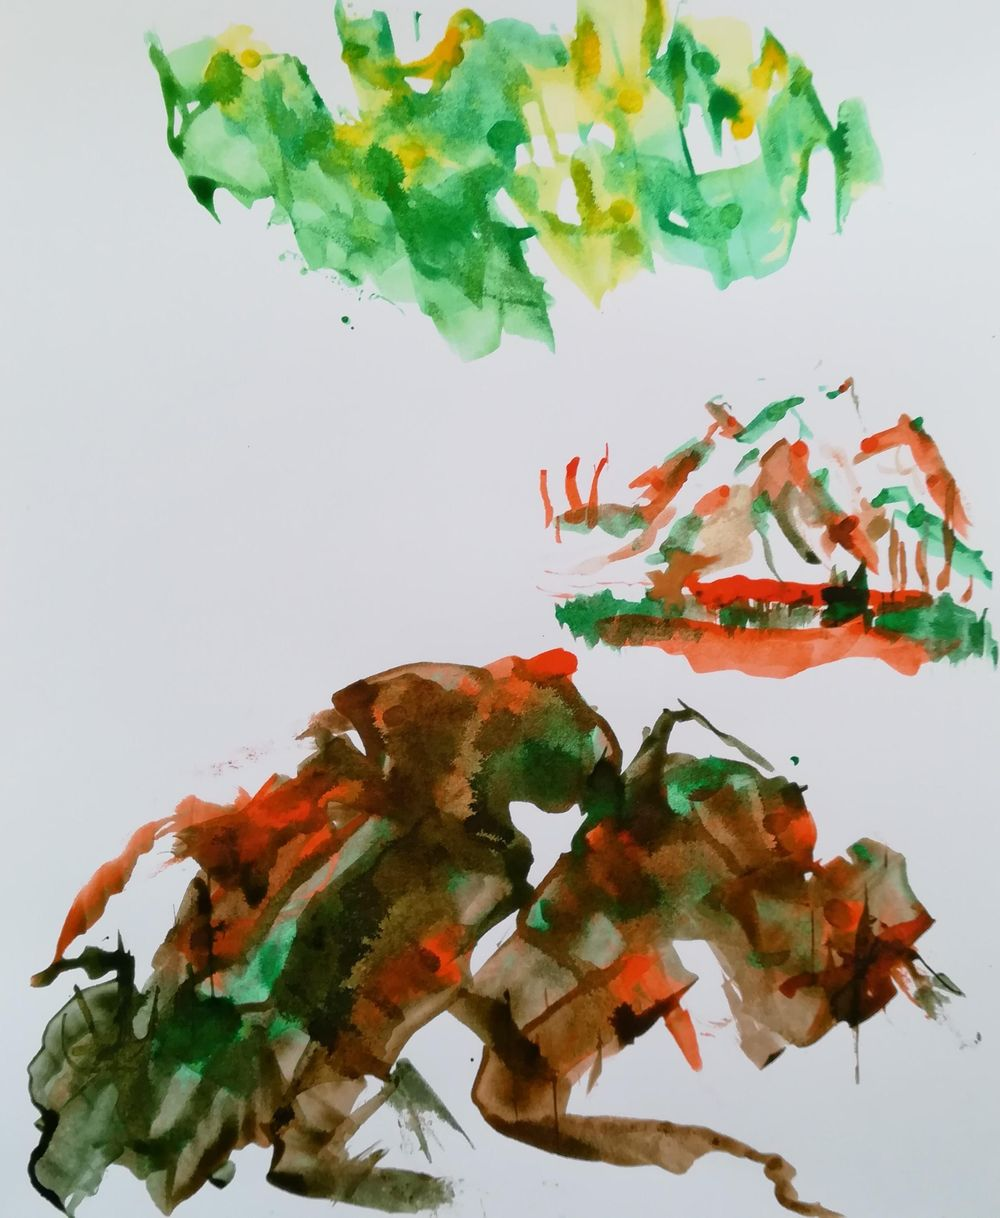 A splash of colour - image 4 - student project